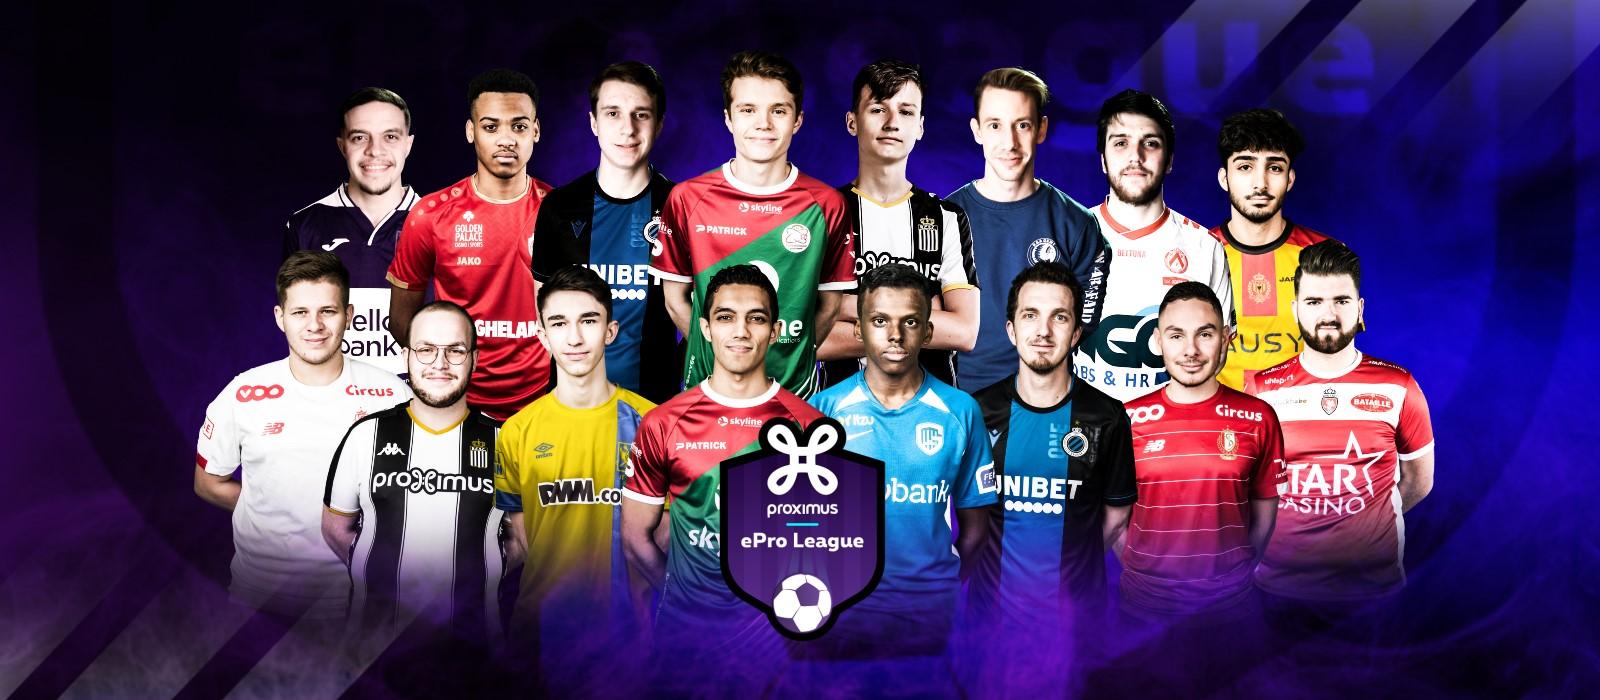 Proximus ePro League